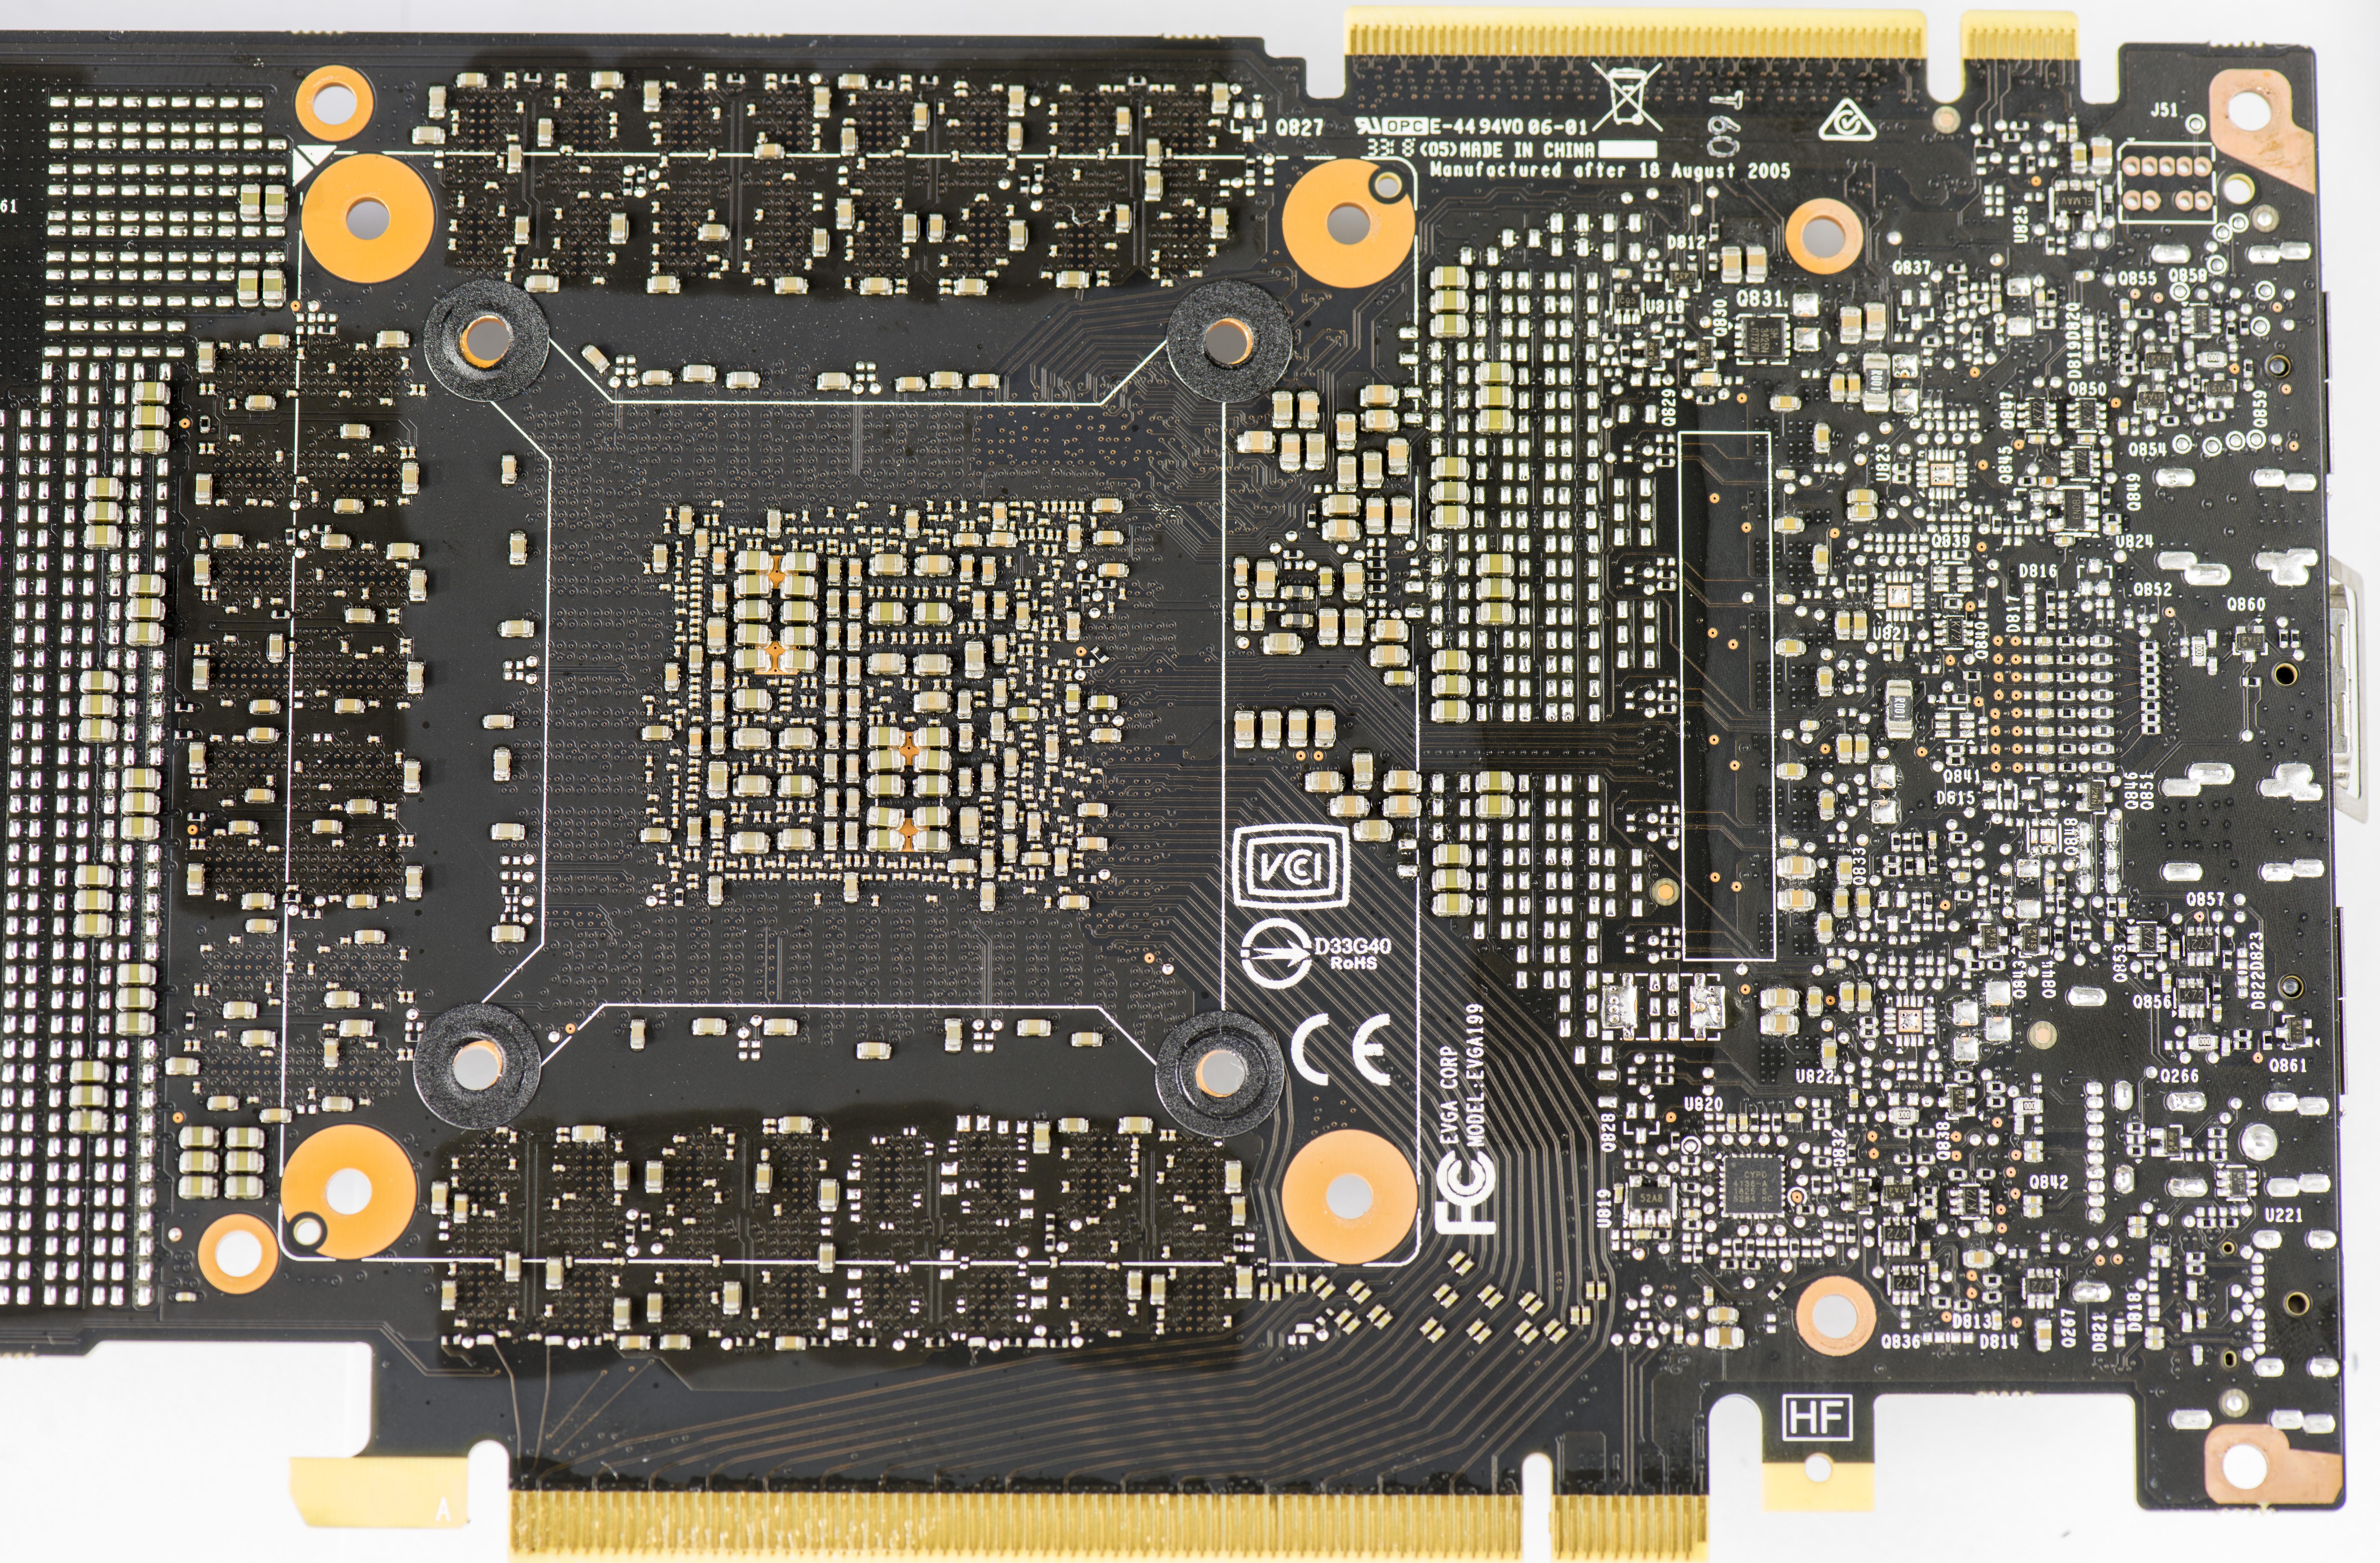 xDevs com | Teardown of the EVGA GeForce RTX 2080 Ti XC Ultra